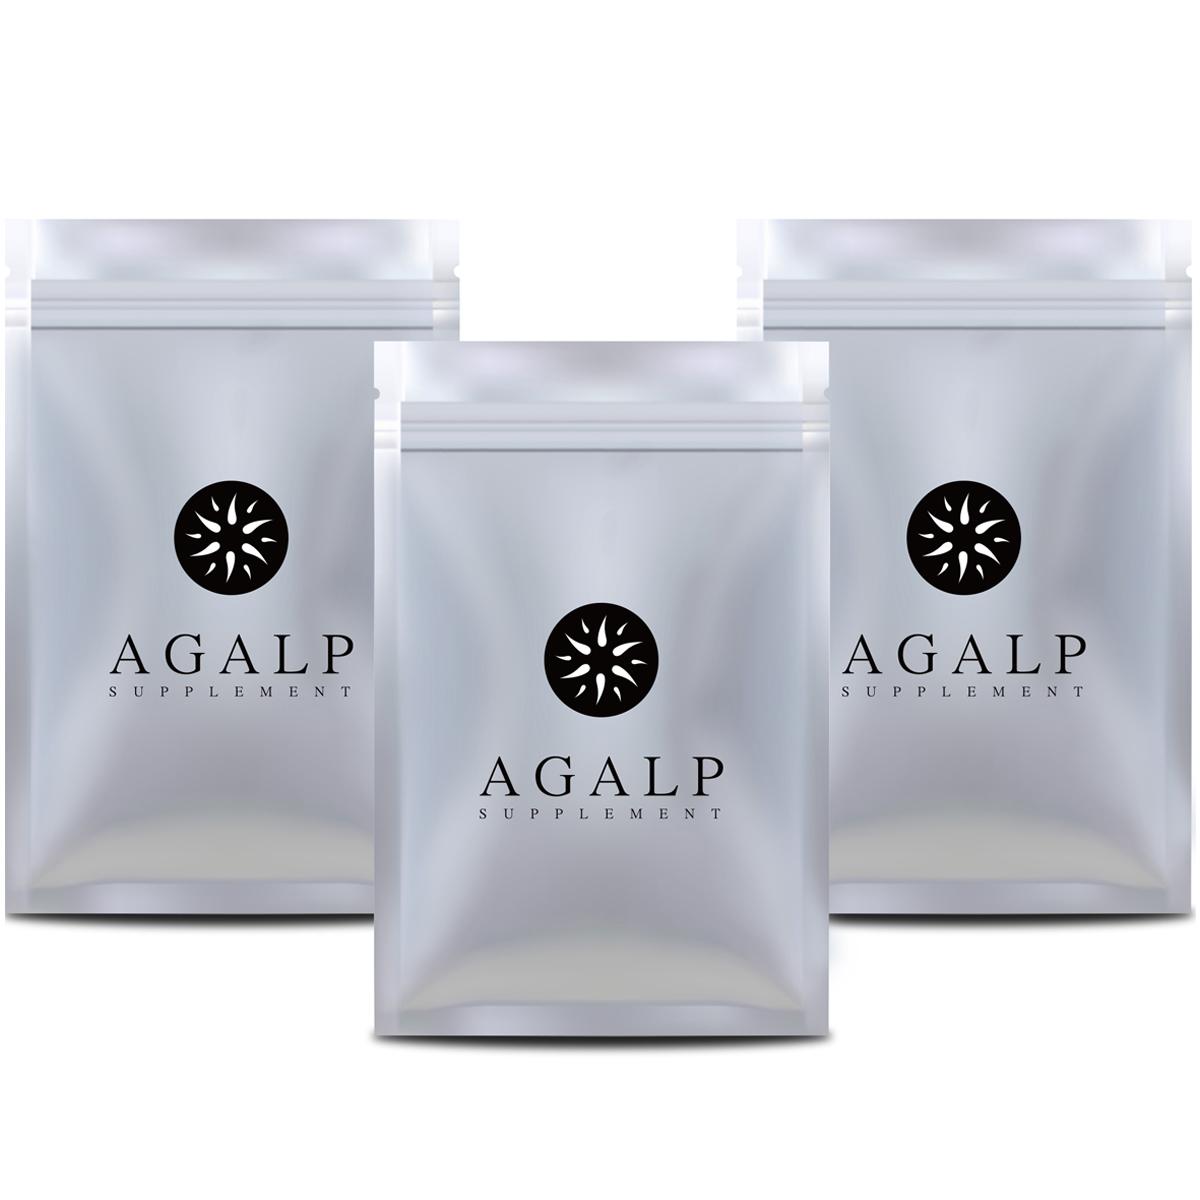 AGALP 育毛 サプリ ノコギリヤシ 亜鉛 育毛 発毛 薄毛 抜け毛 120粒×3袋